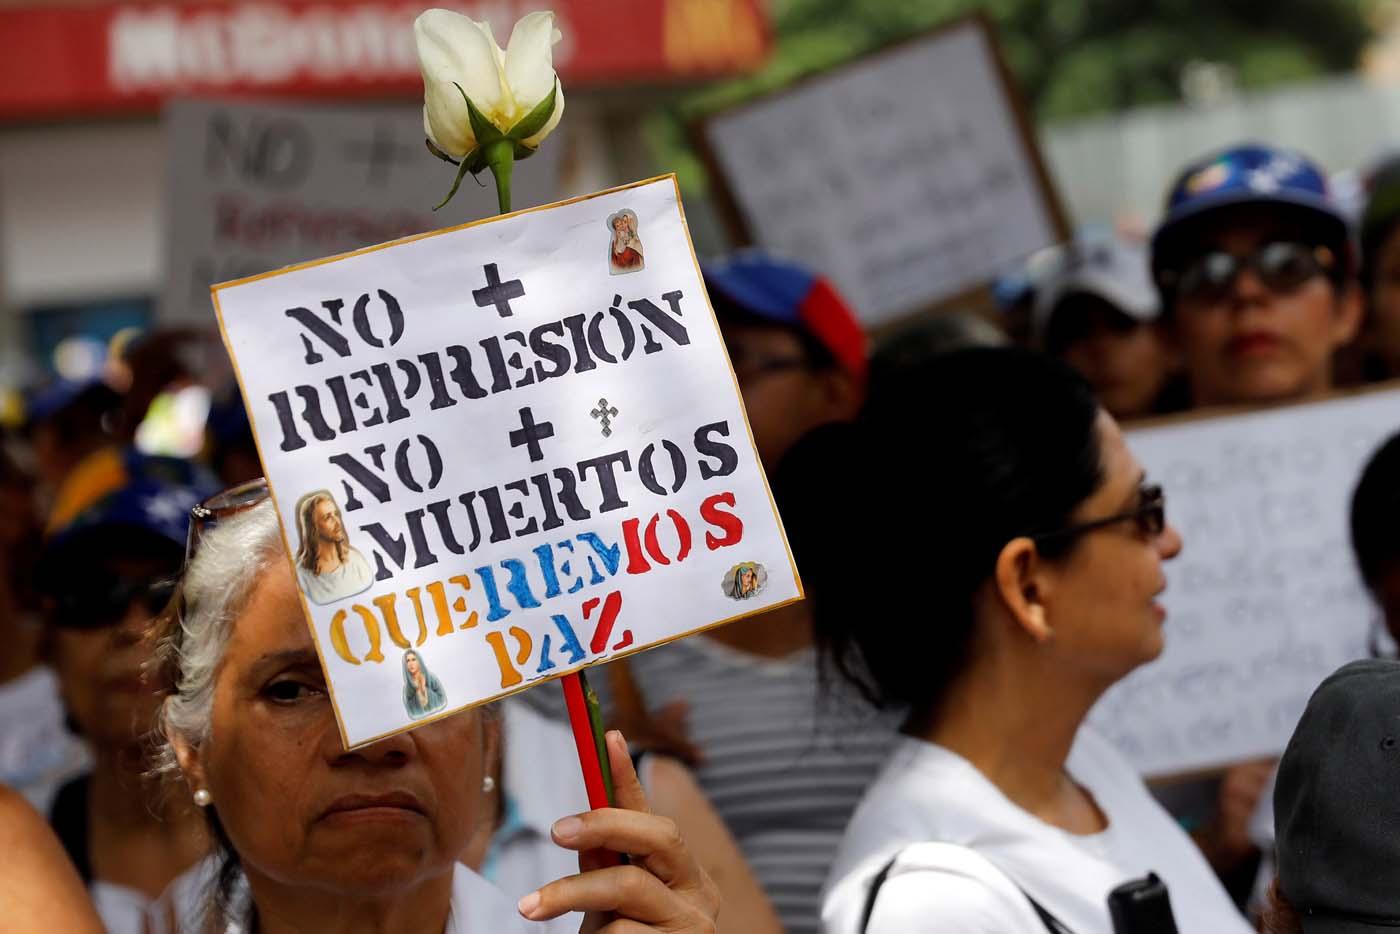 2017-05-06T153632Z_1864134204_RC1746B96D70_RTRMADP_3_VENEZUELA-POLITICS